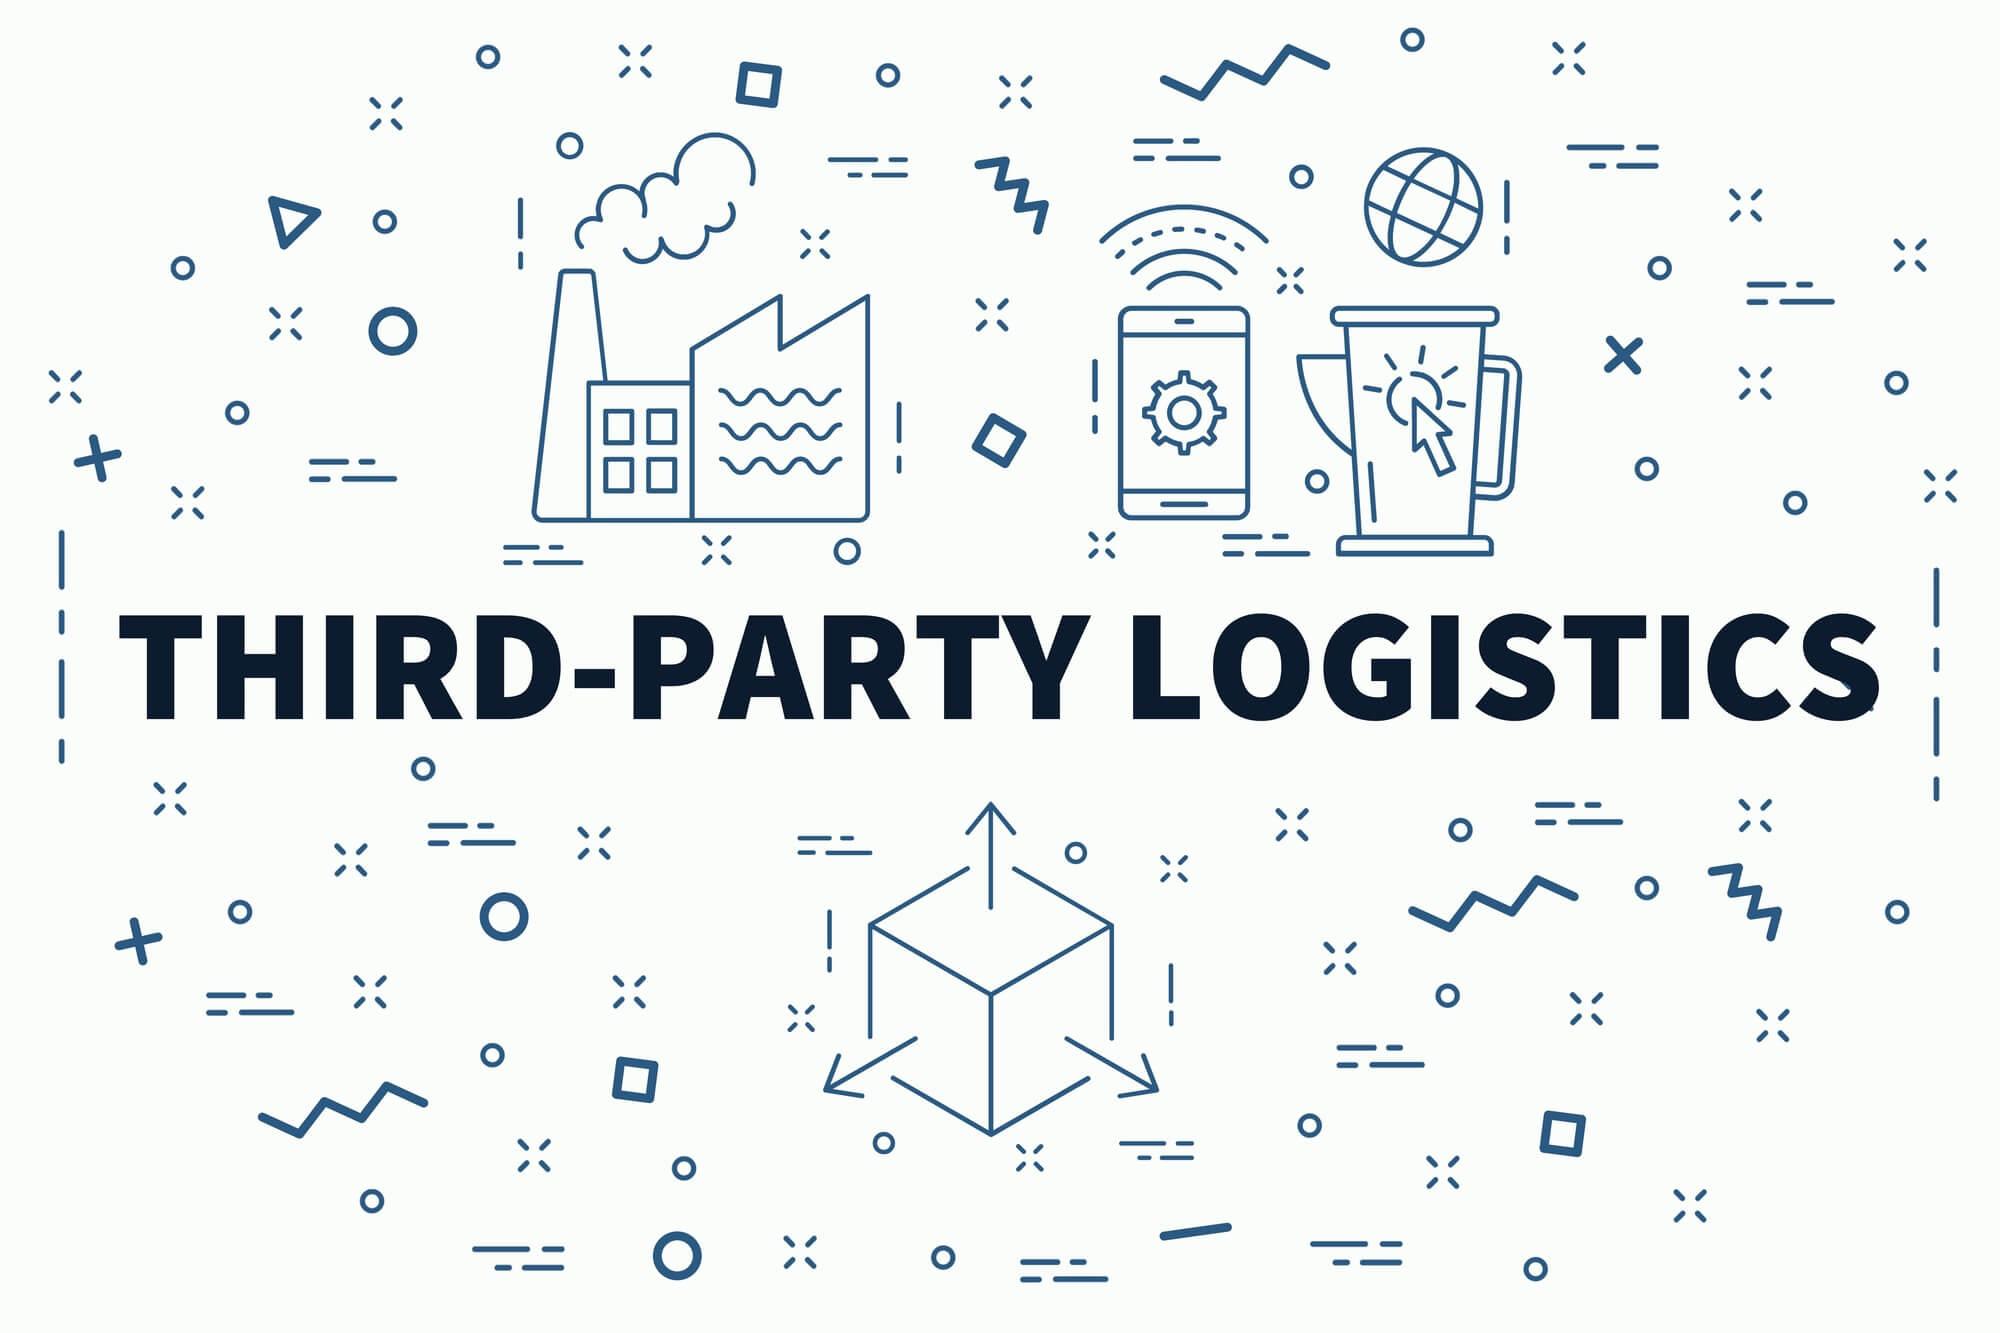 3rd Party Logistics